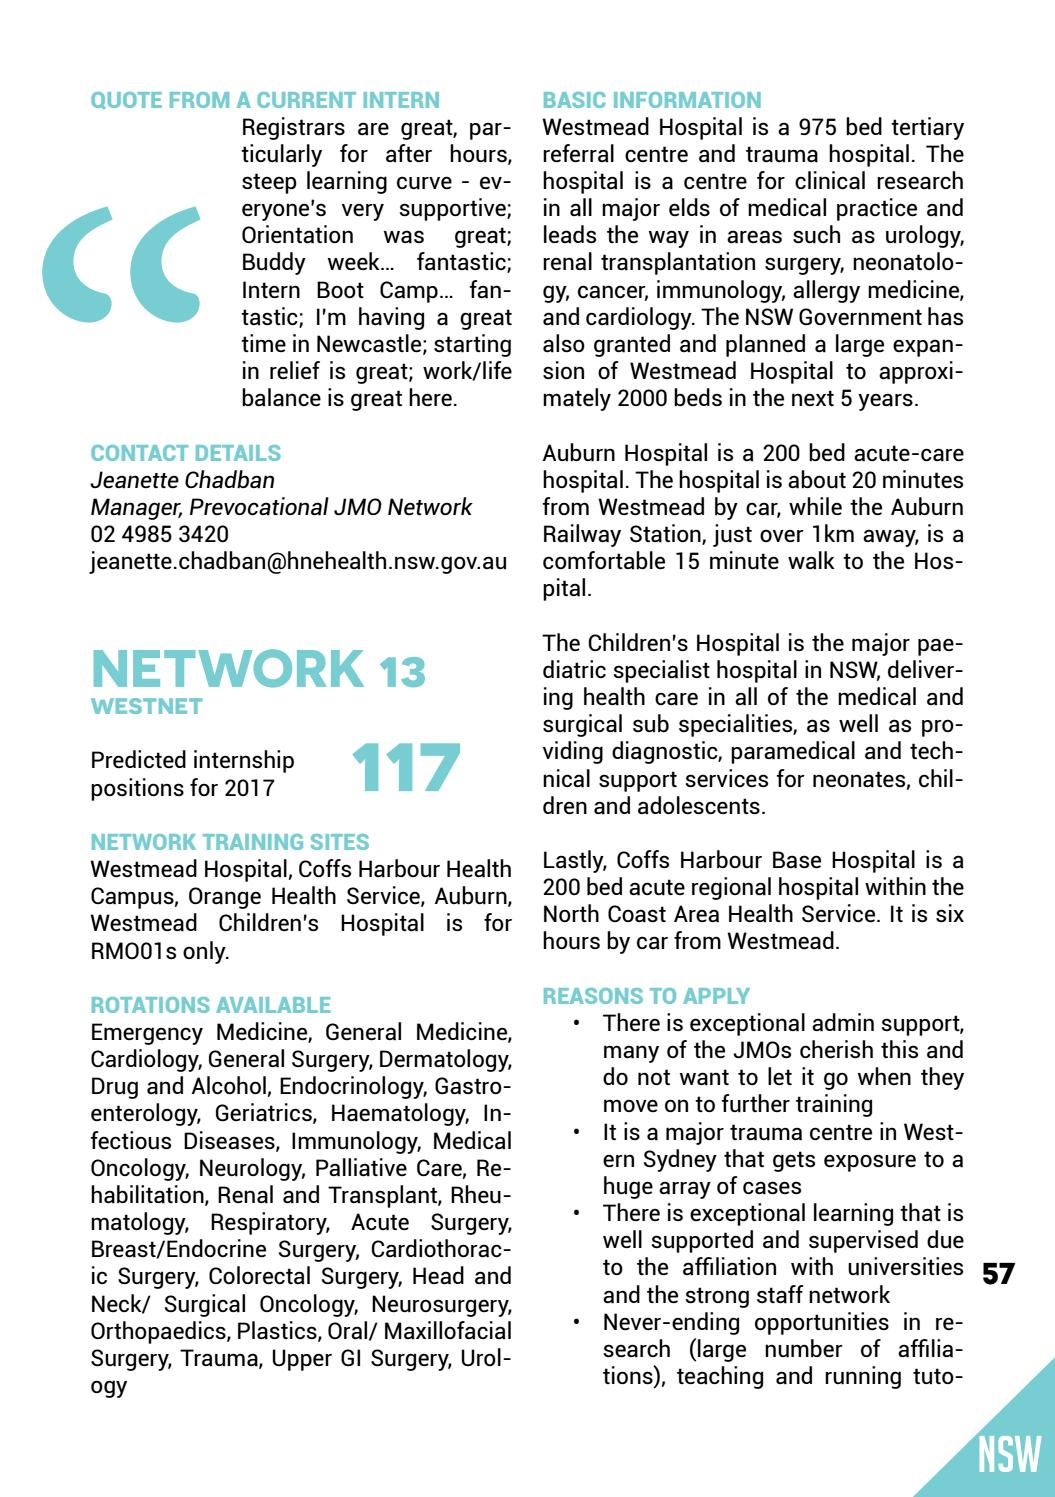 AMSA's 2016 Internship & Residency Guide by The Australian Medical